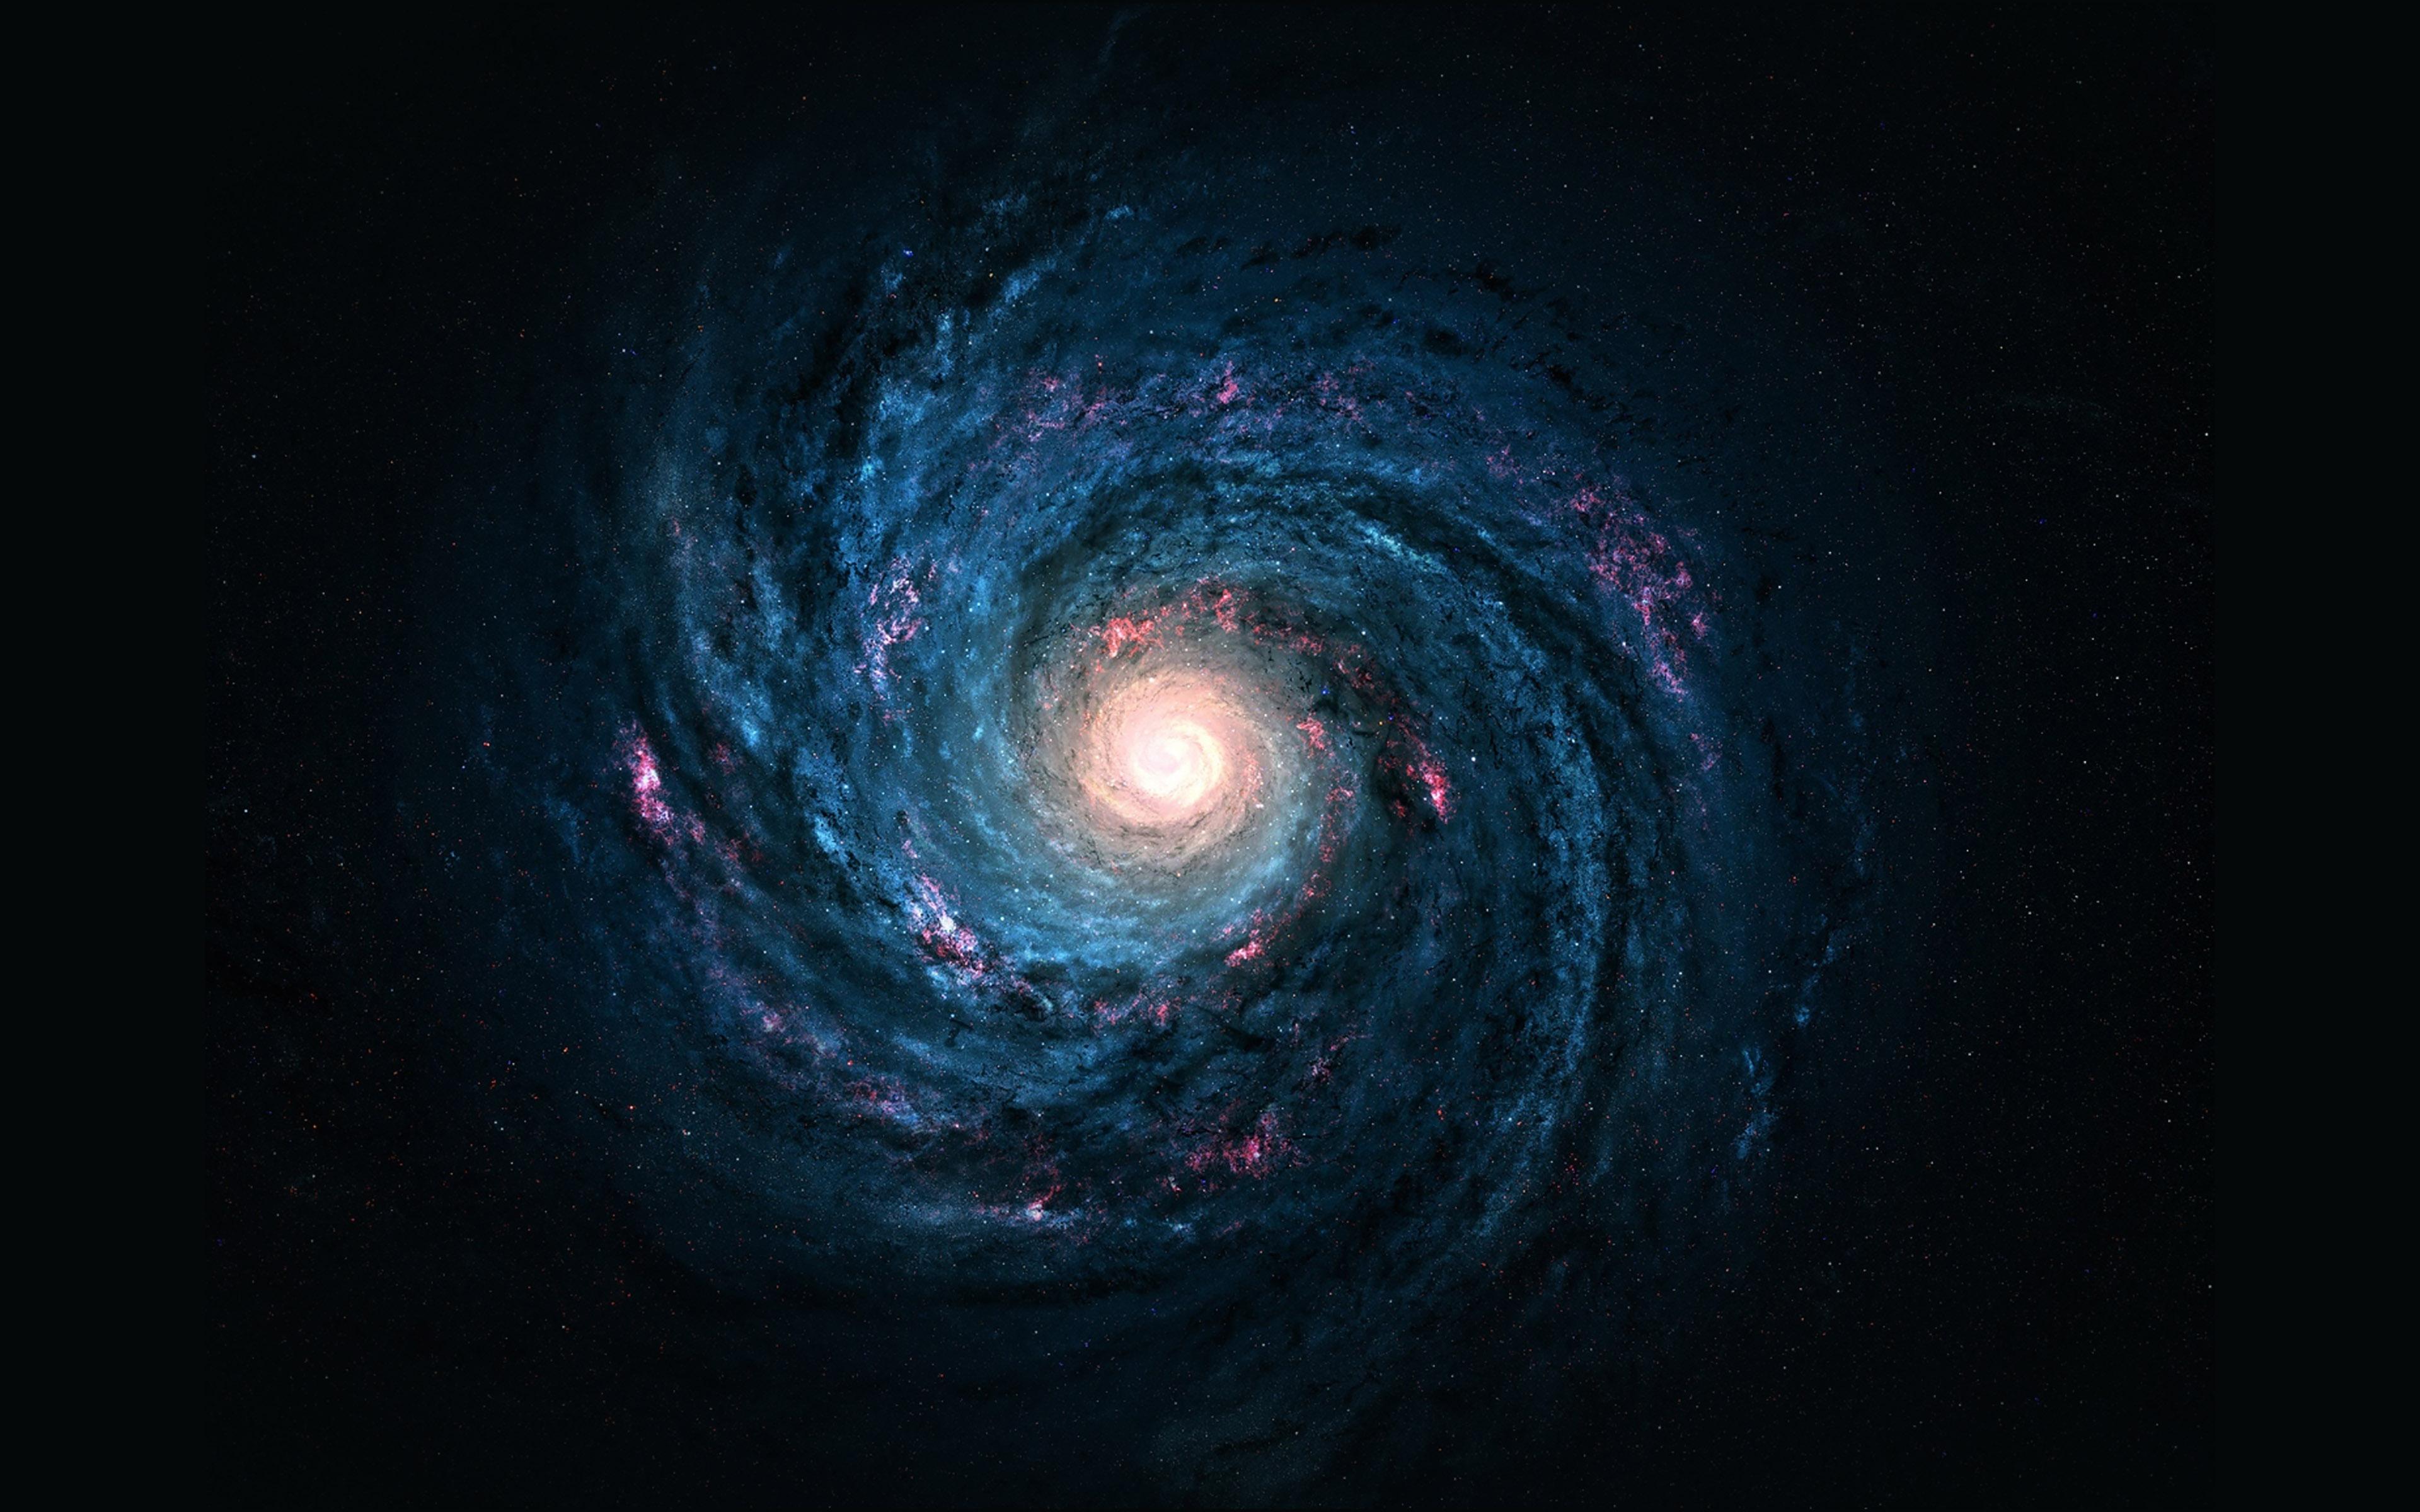 Spiral Galaxy Art 4k Wallpapers: Mc41-wallpaper-space-galaxy-stars-milky-way